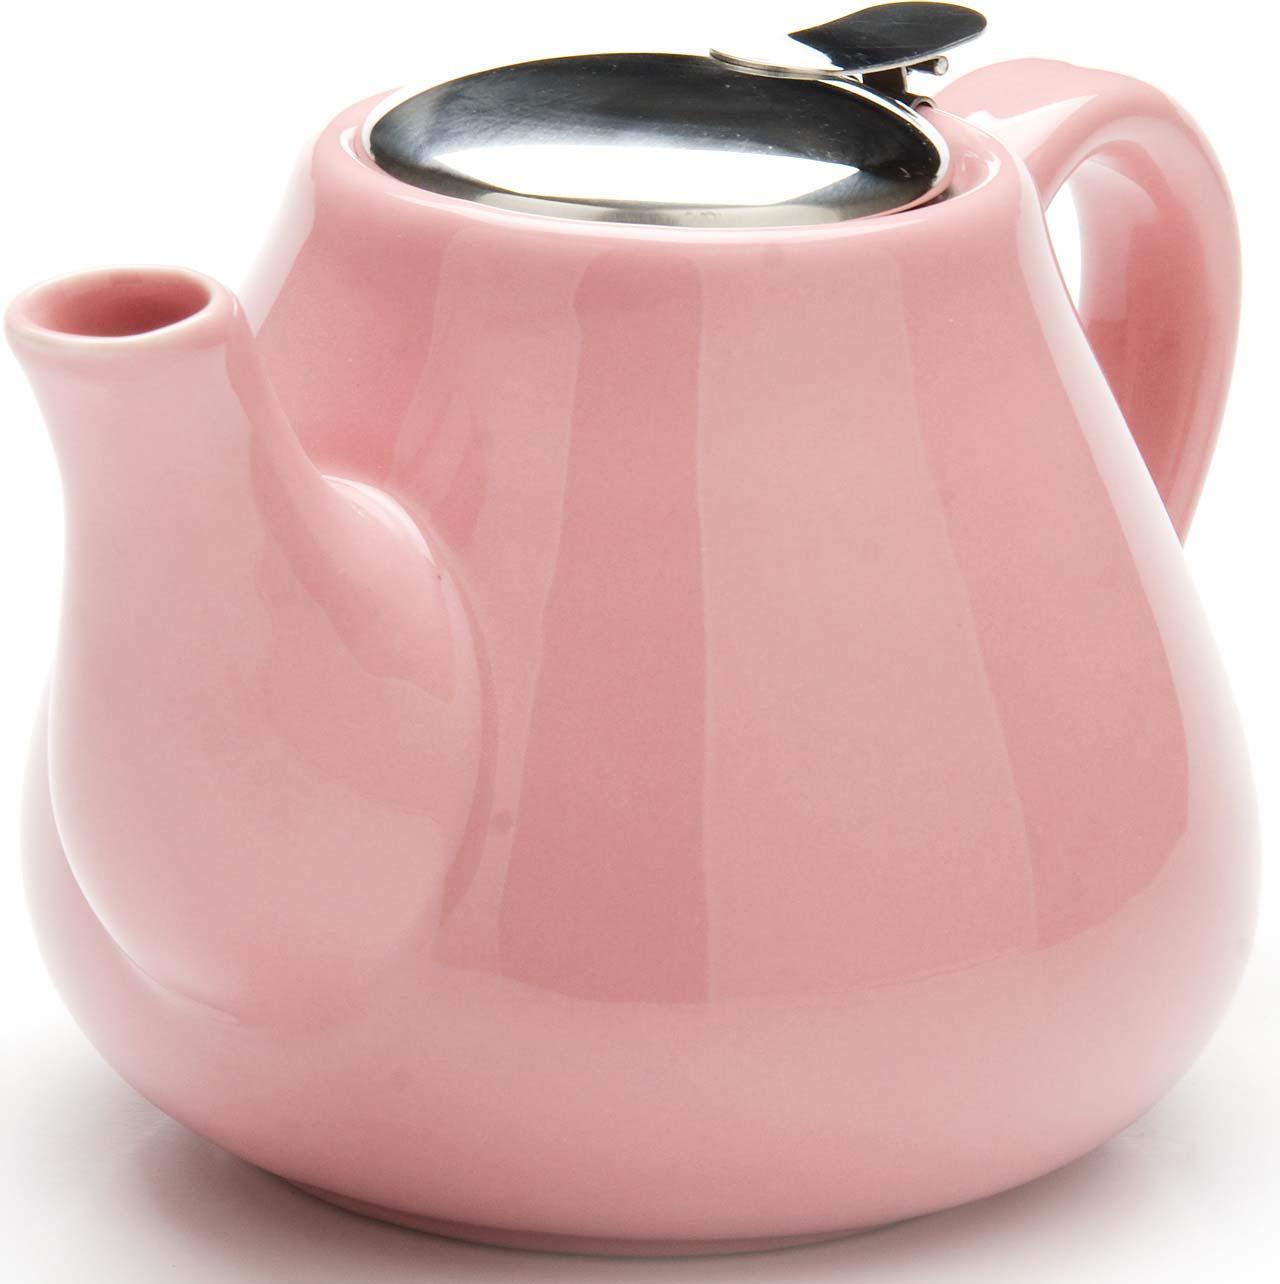 Чайник заварочный Loraine, цвет: розовый, 950 мл